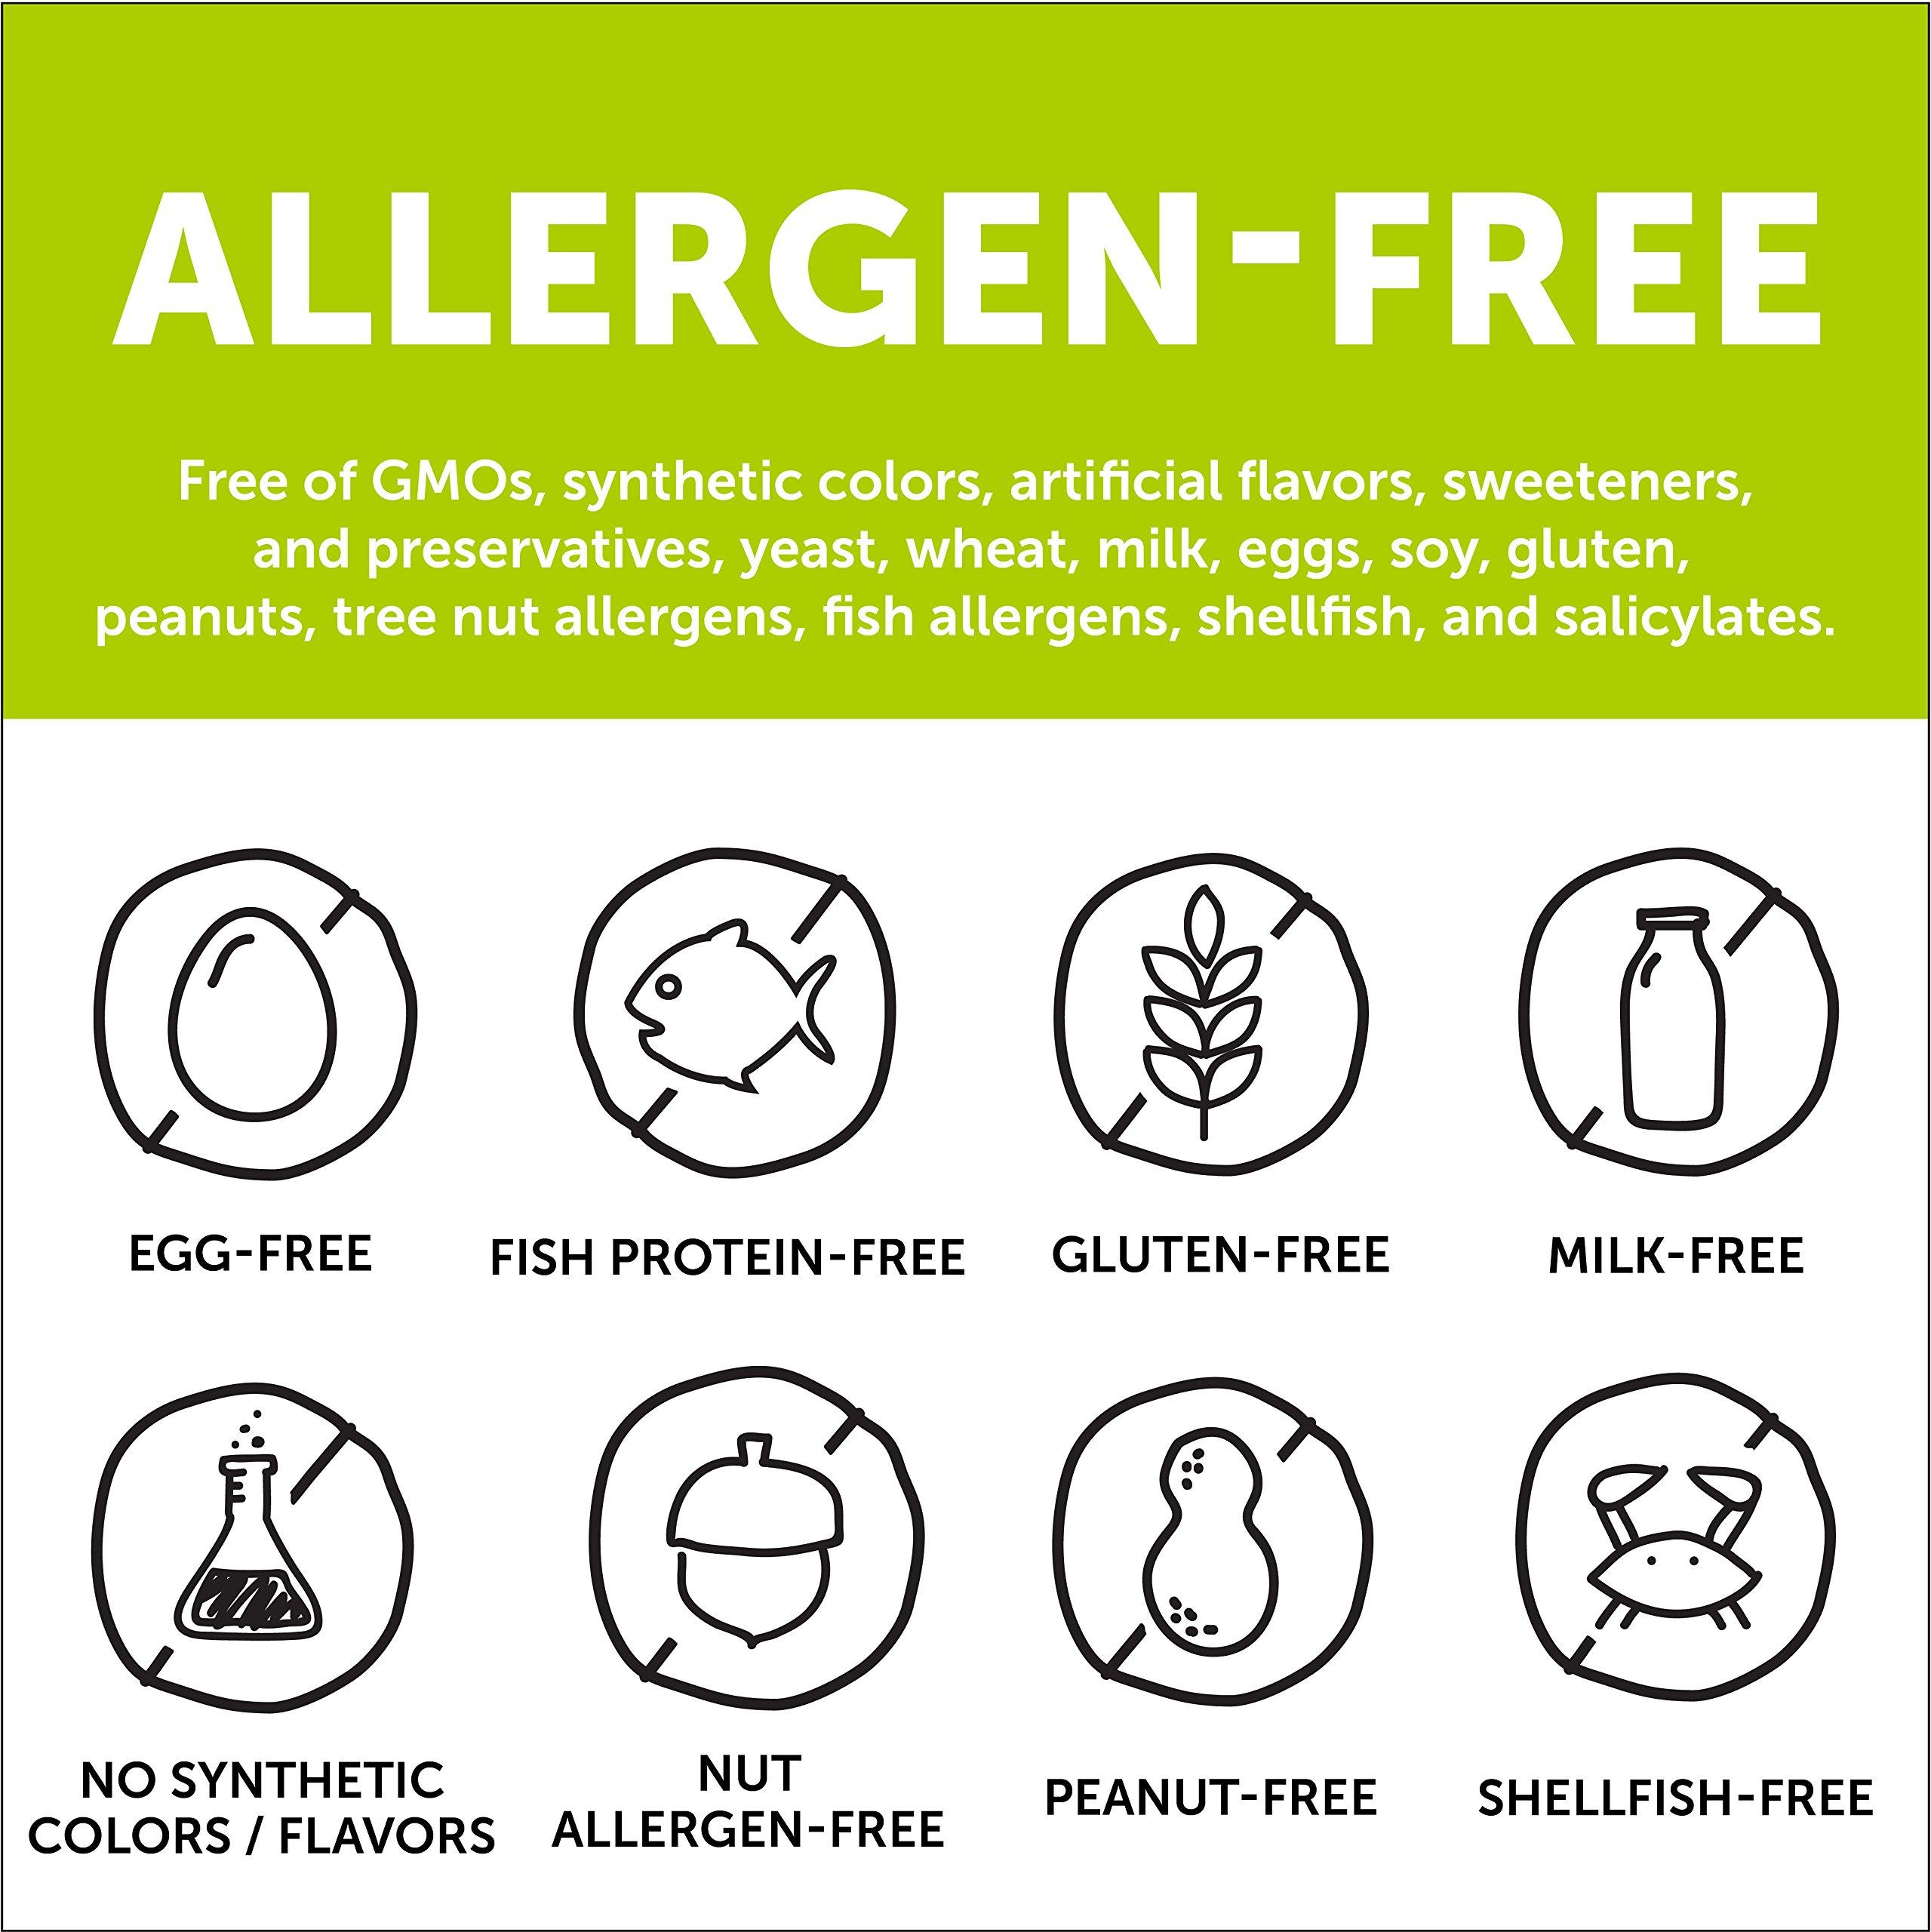 SmartyPants Vegetarian Organic Kids Daily Gummy Vitamins: Multivitamin, Gluten Free, Non-GMO, Omega-3, Probiotic, Vitamin D3, Methylcobalamin B12, Zinc; 120 Count (30 Day Supply) by SmartyPants Vitamins (Image #9)